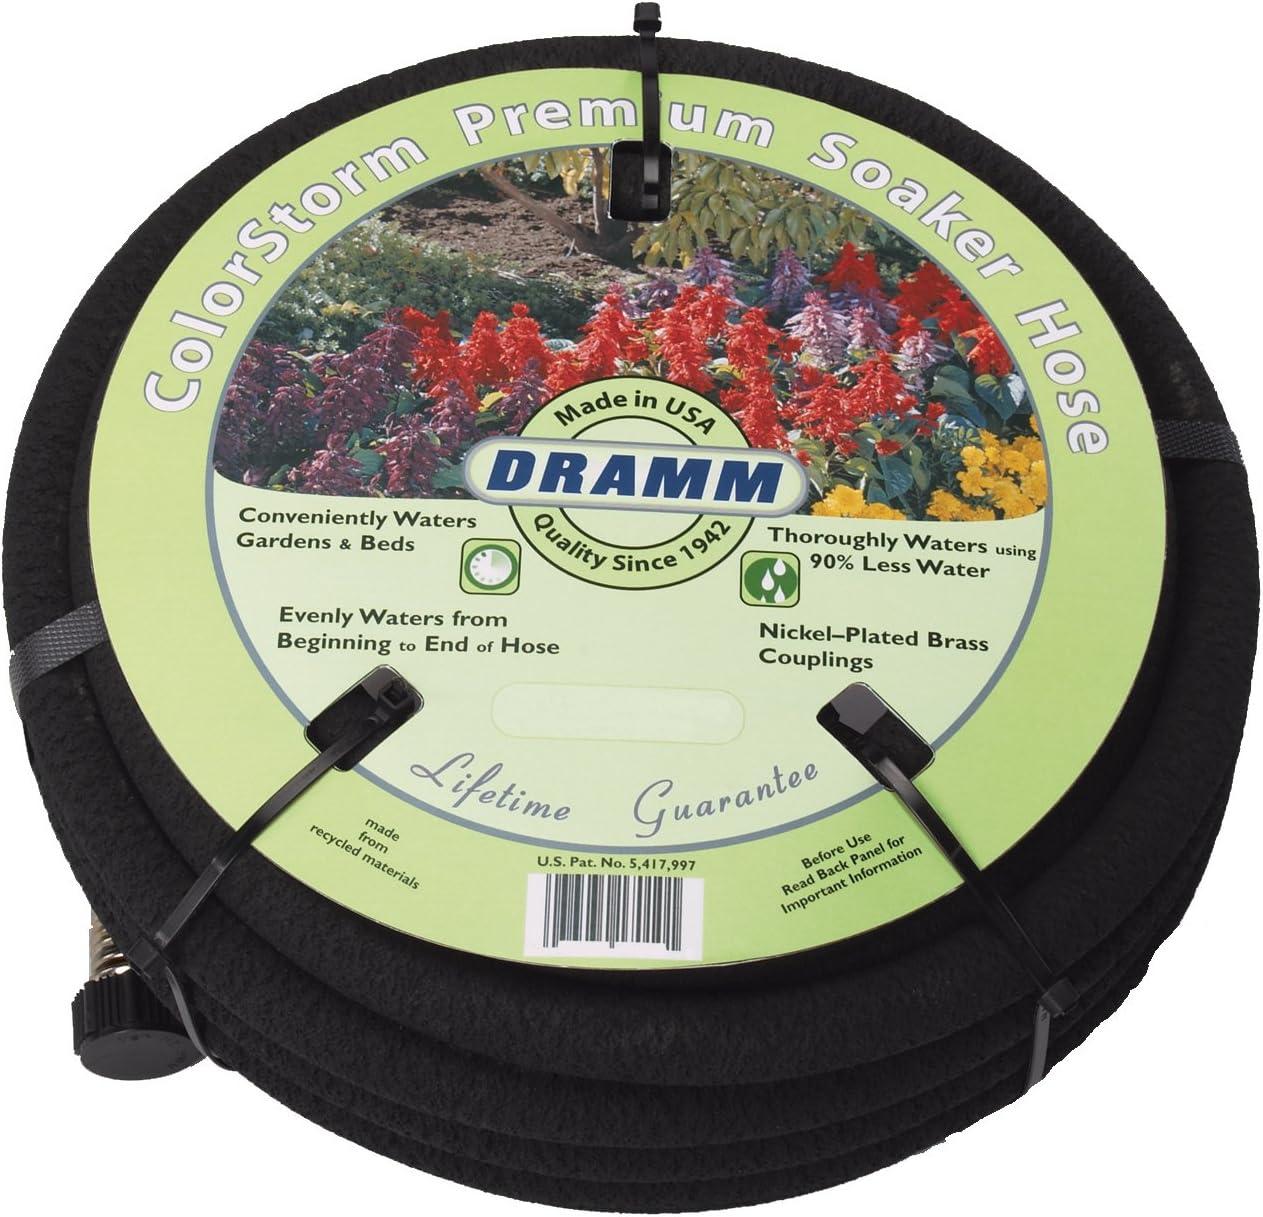 Dramm ColorStorm Premium Soaker